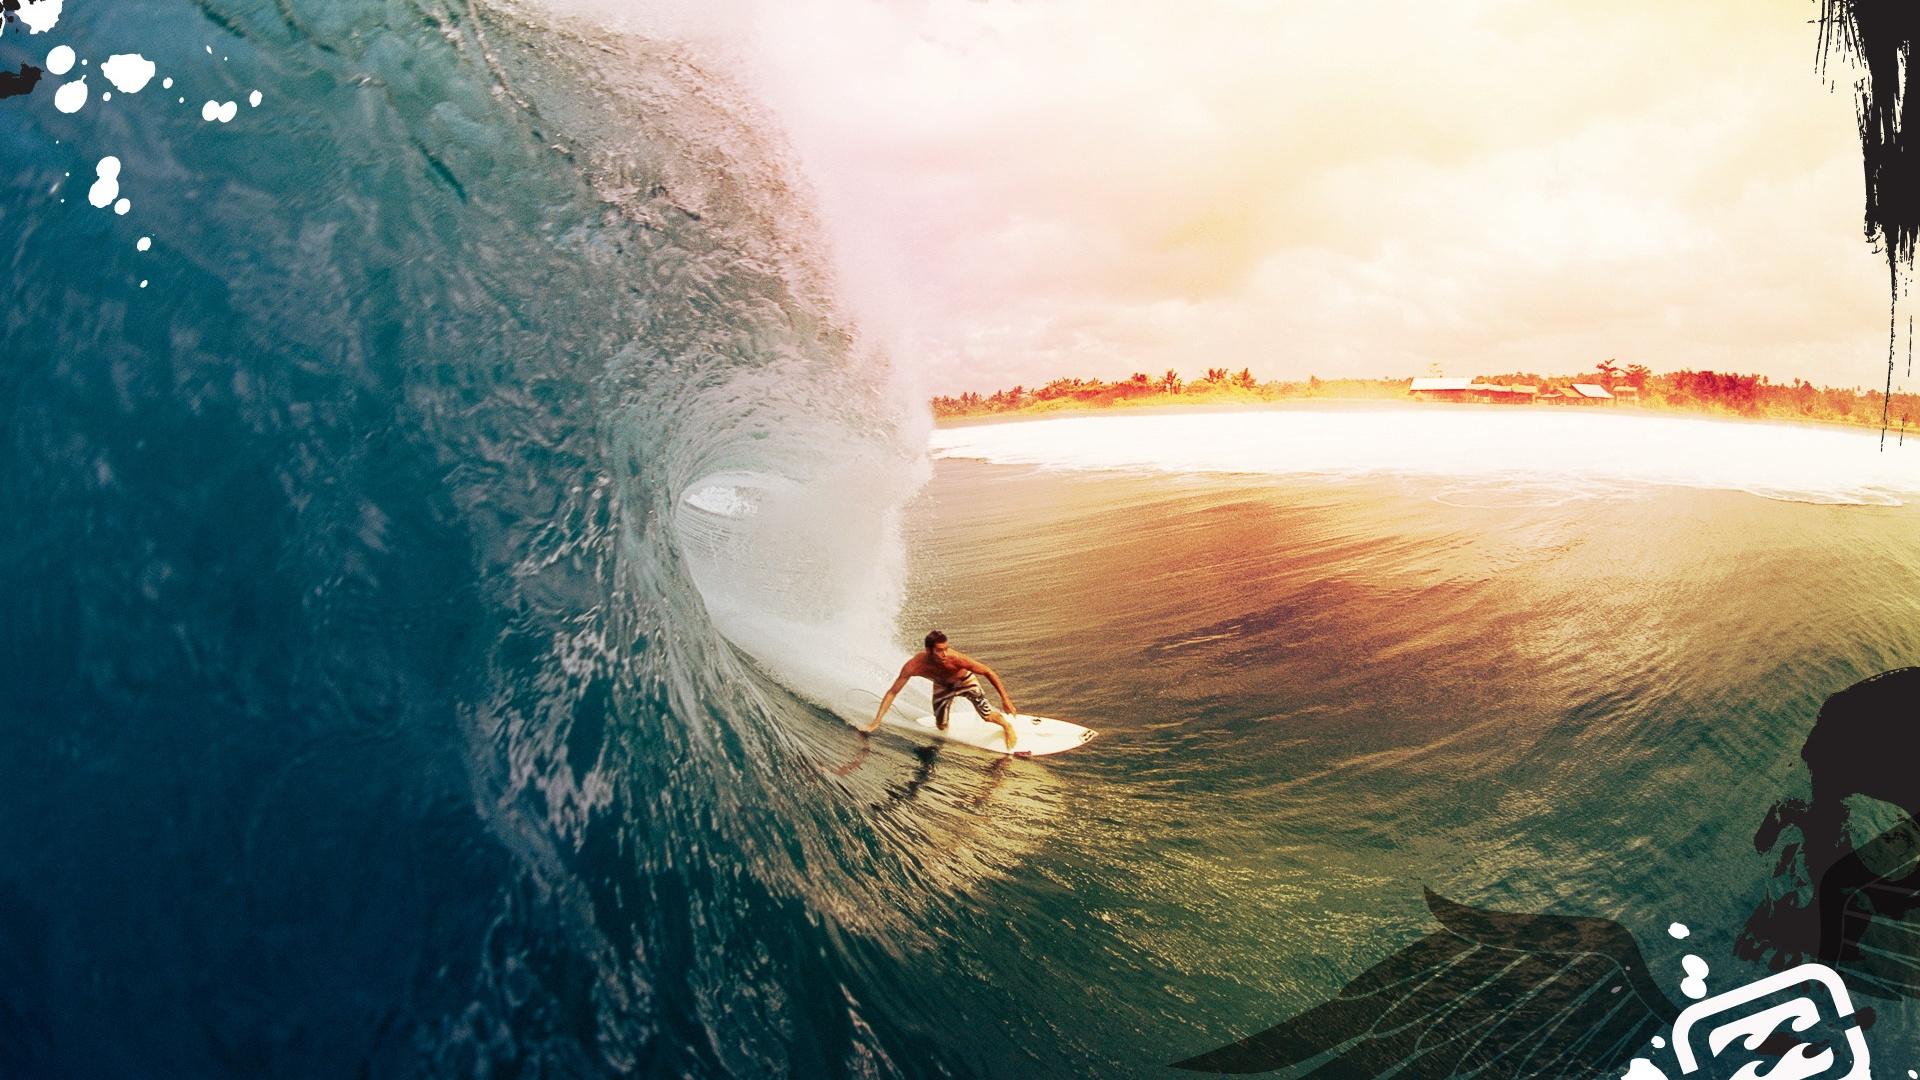 underwater surfer girl desktop - photo #6